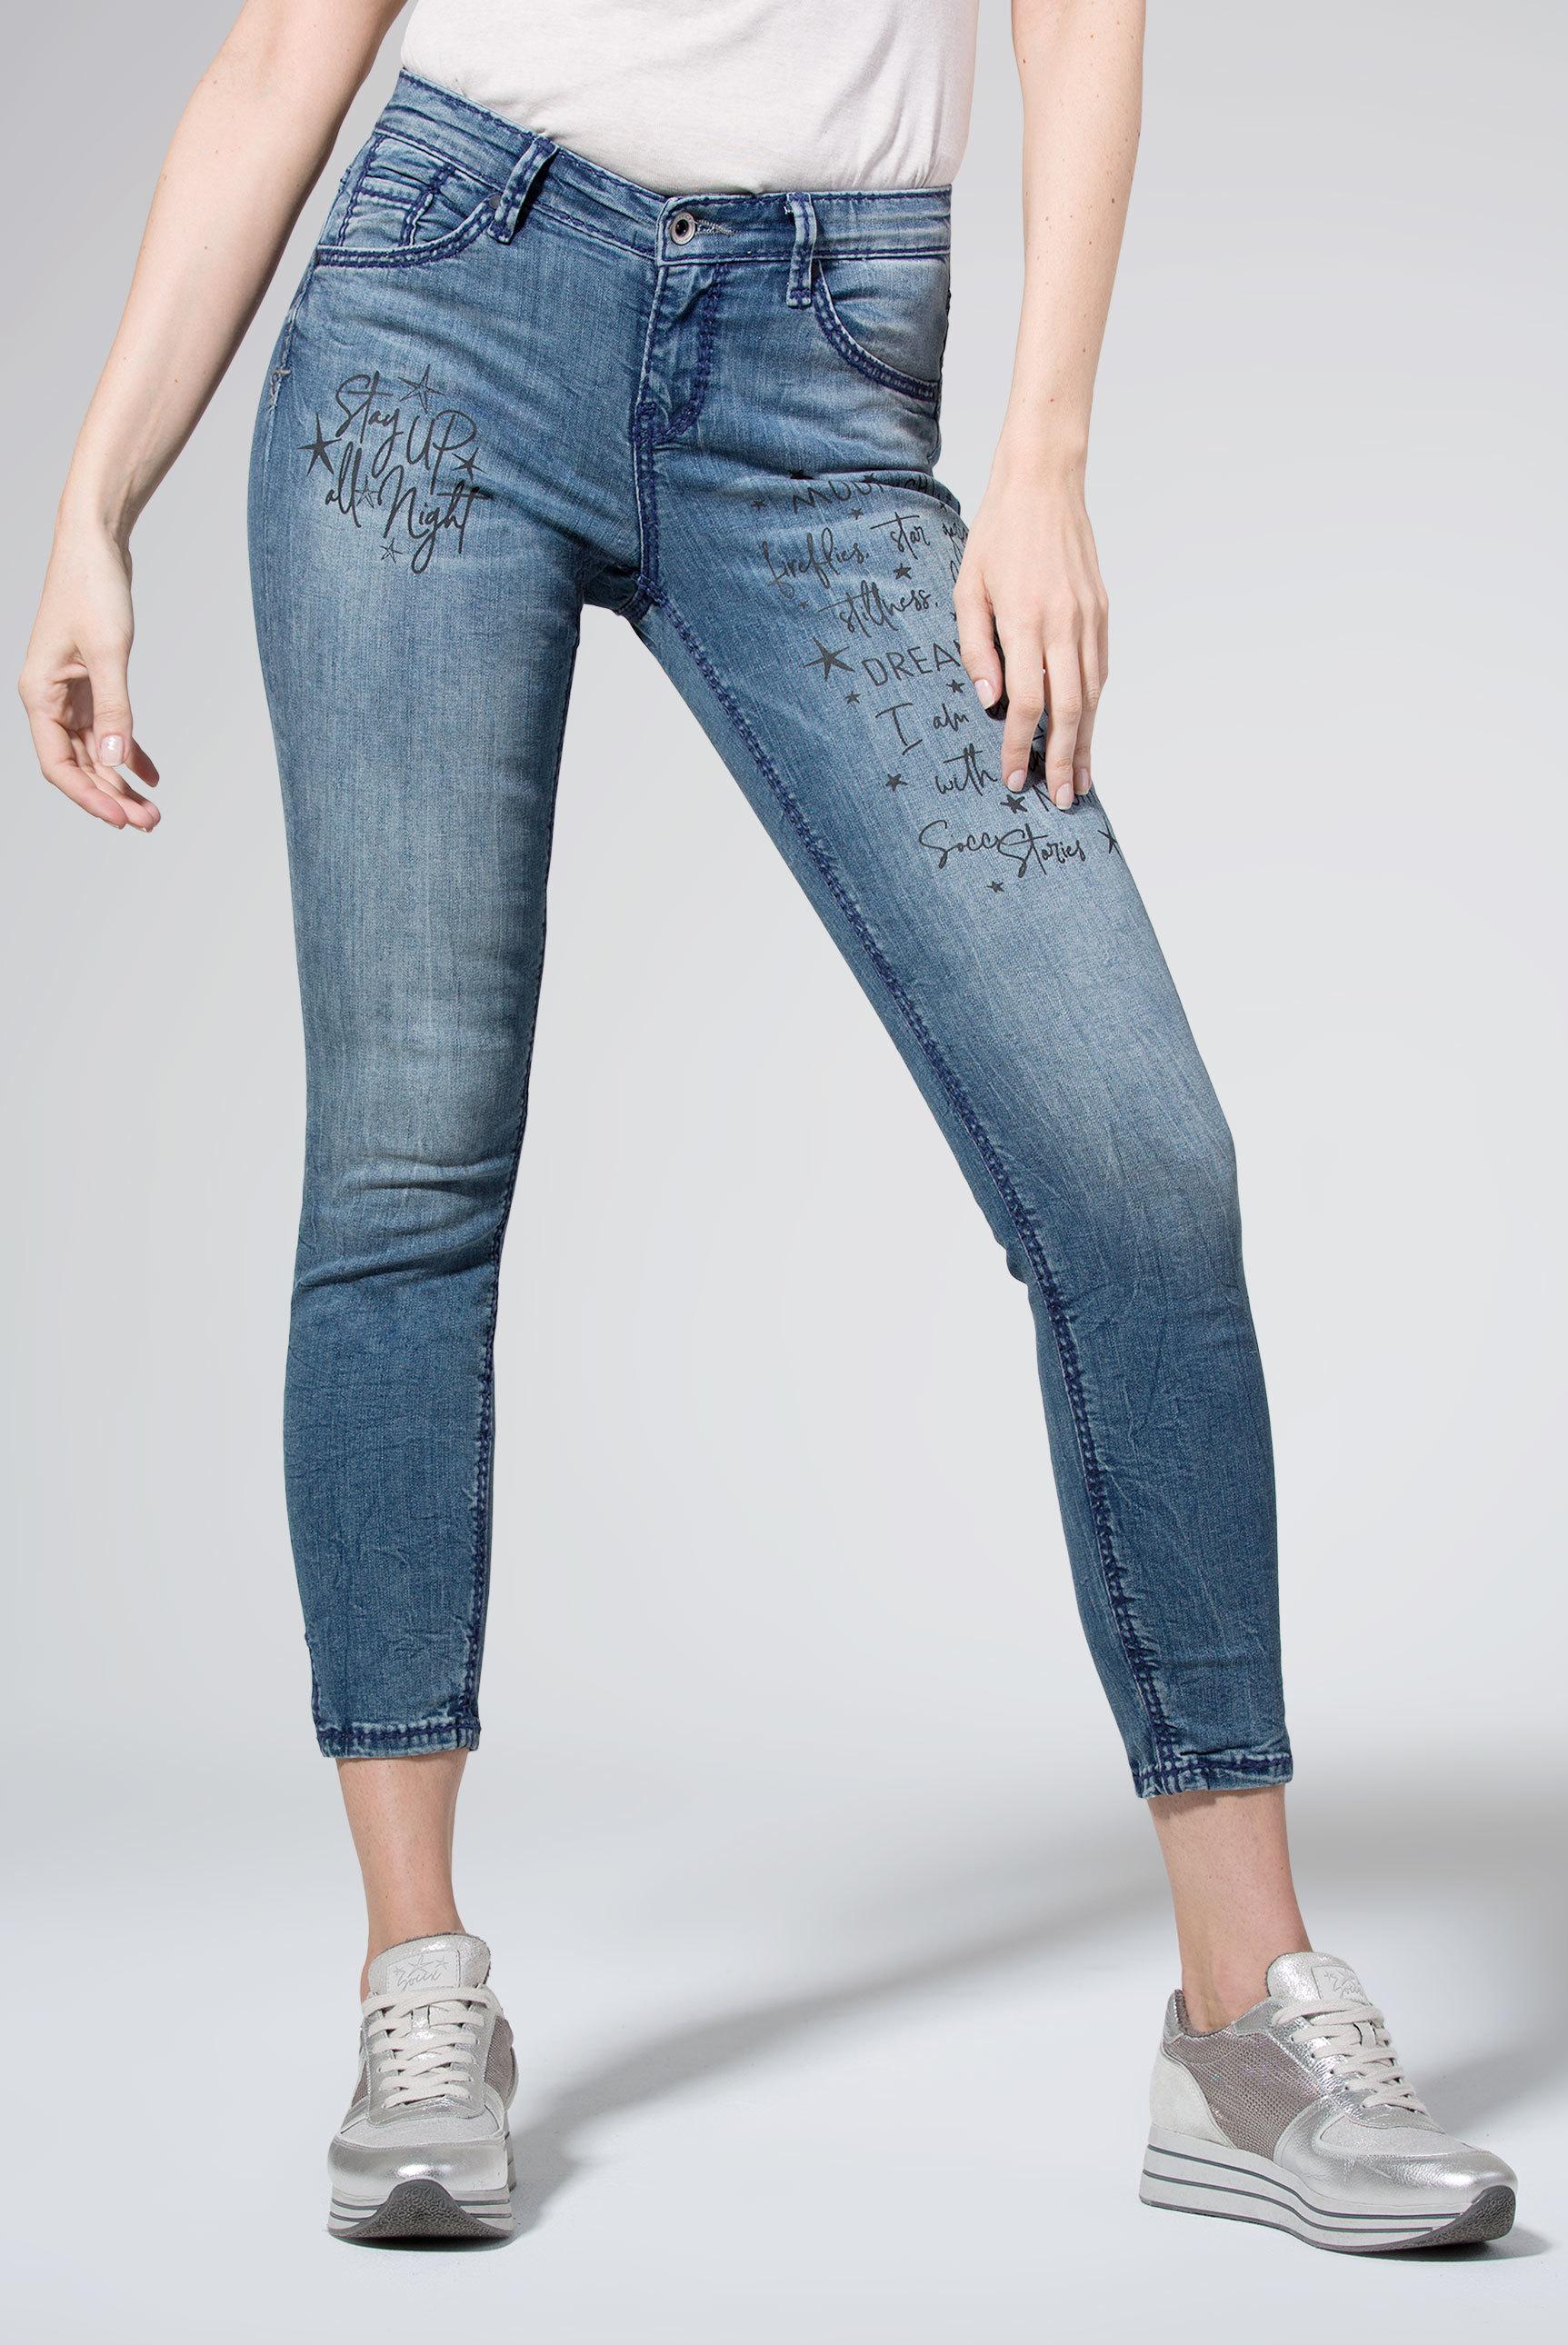 Salt Water Washed Jeans MI:RA mit Artworks